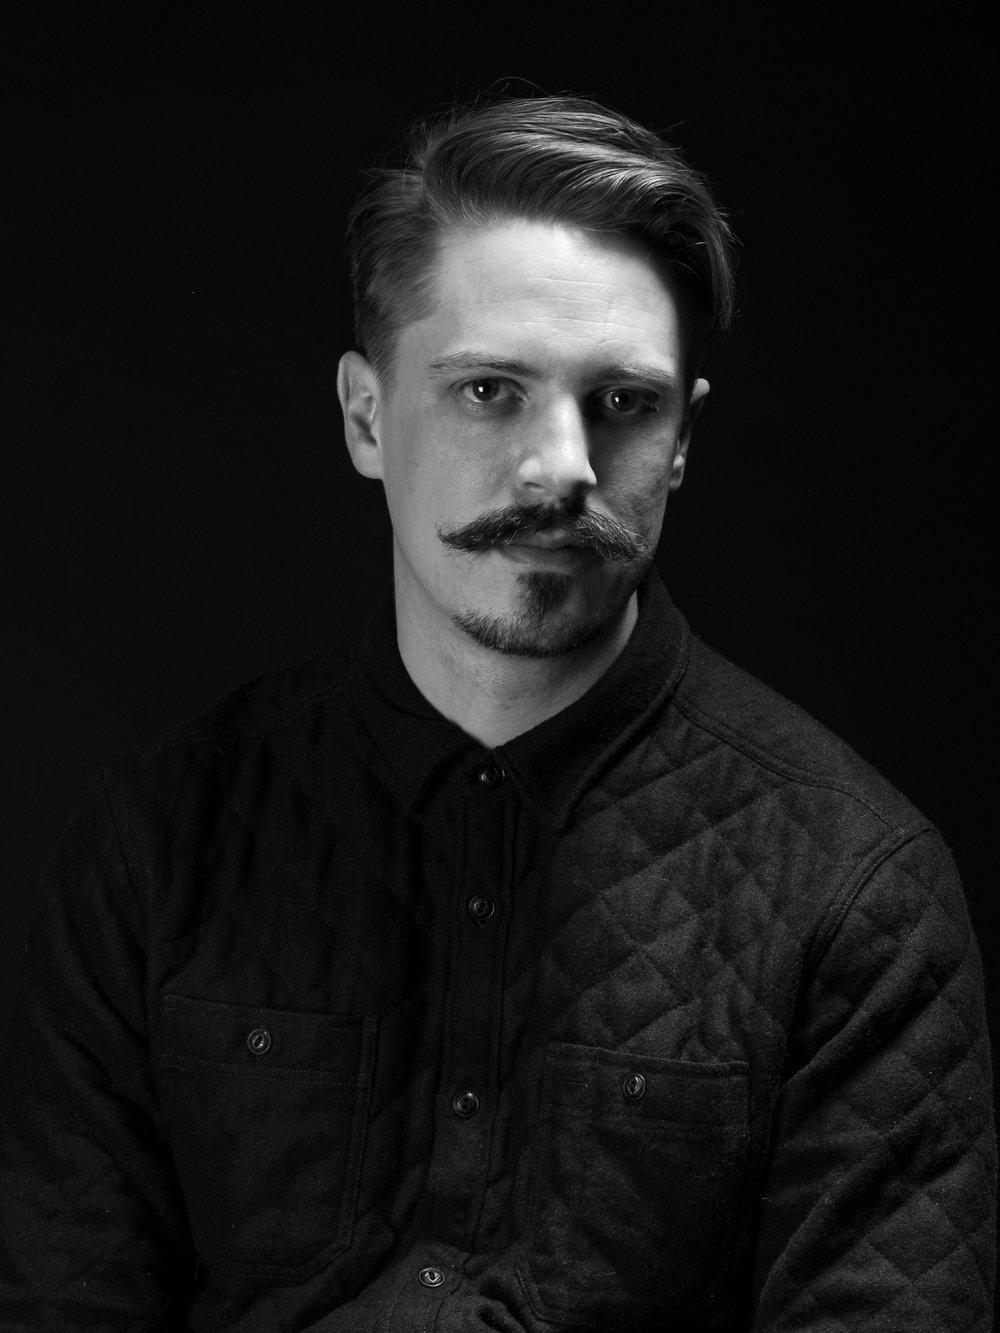 CALEB SIMMONS - ILLUSTRATOR & DESIGNER